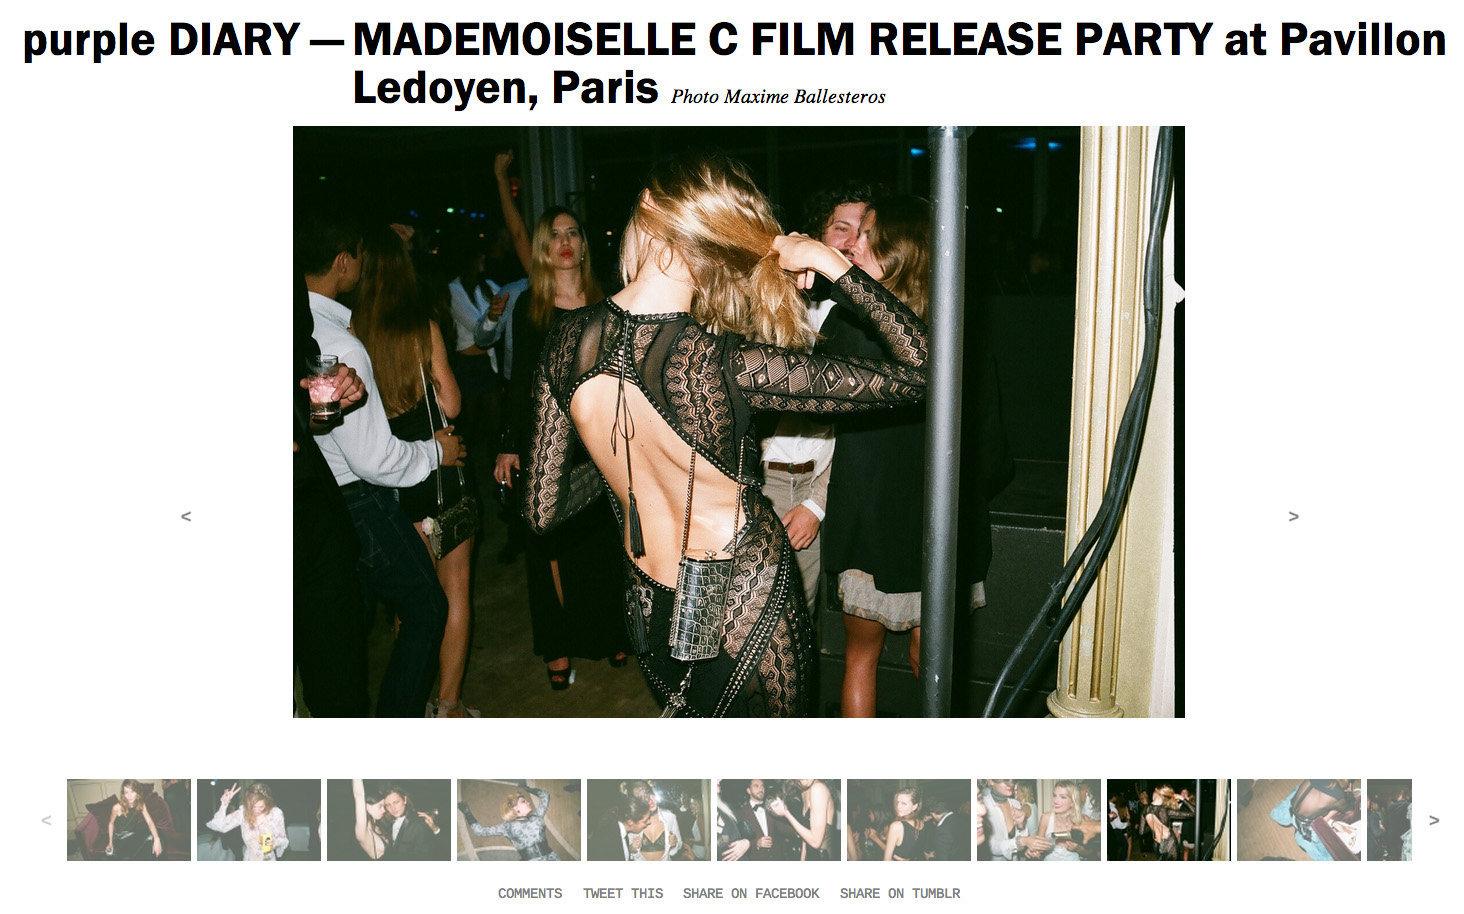 purple DIARY   MADEMOISELLE C FILM RELEASE PARTY at Pavillon Ledoyen  Paris.jpg